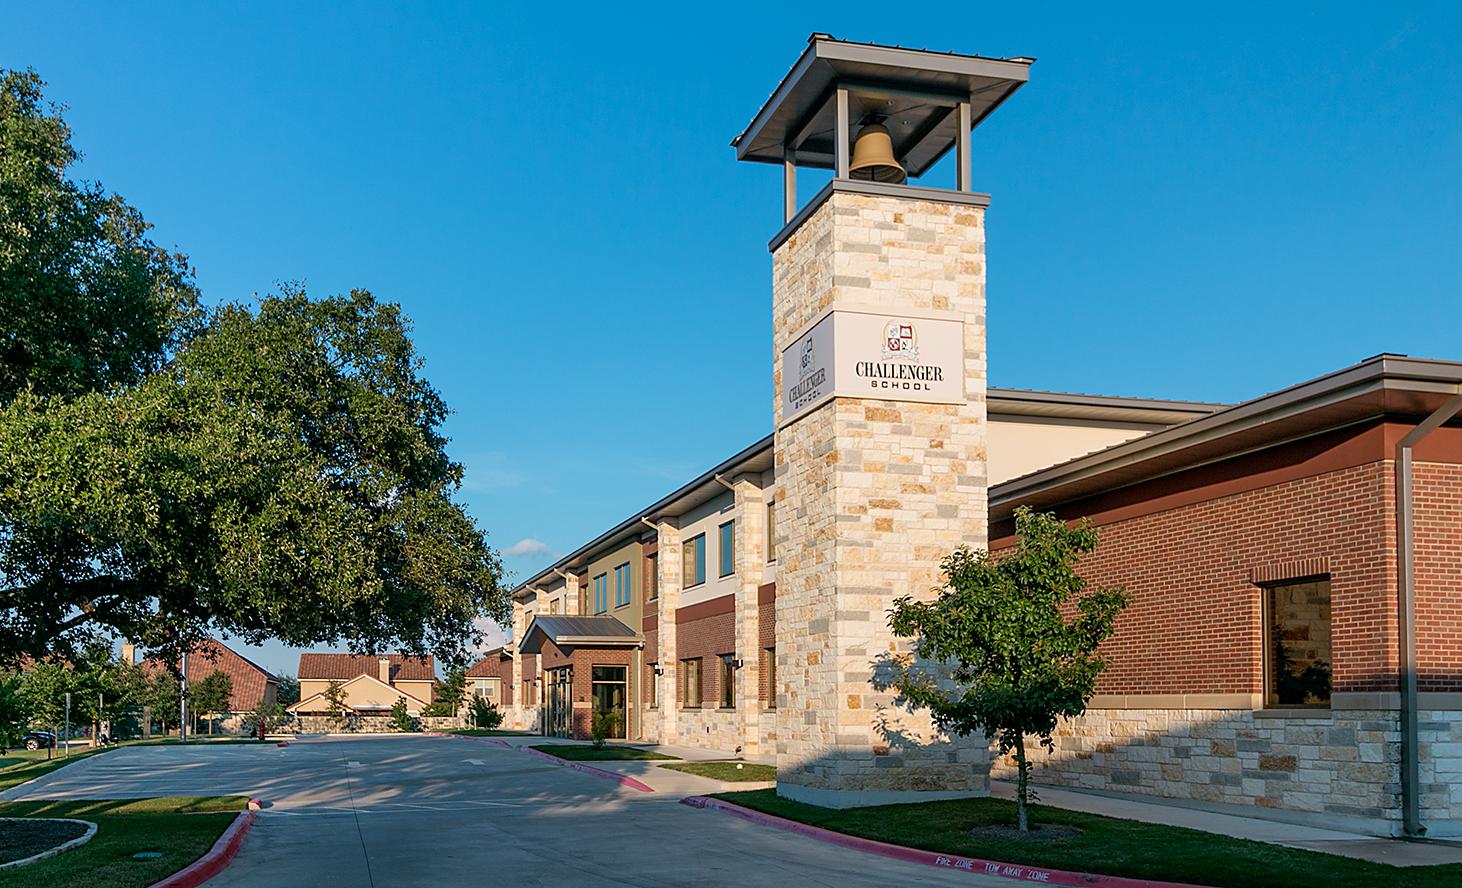 Challenger School - Avery Ranch image 10